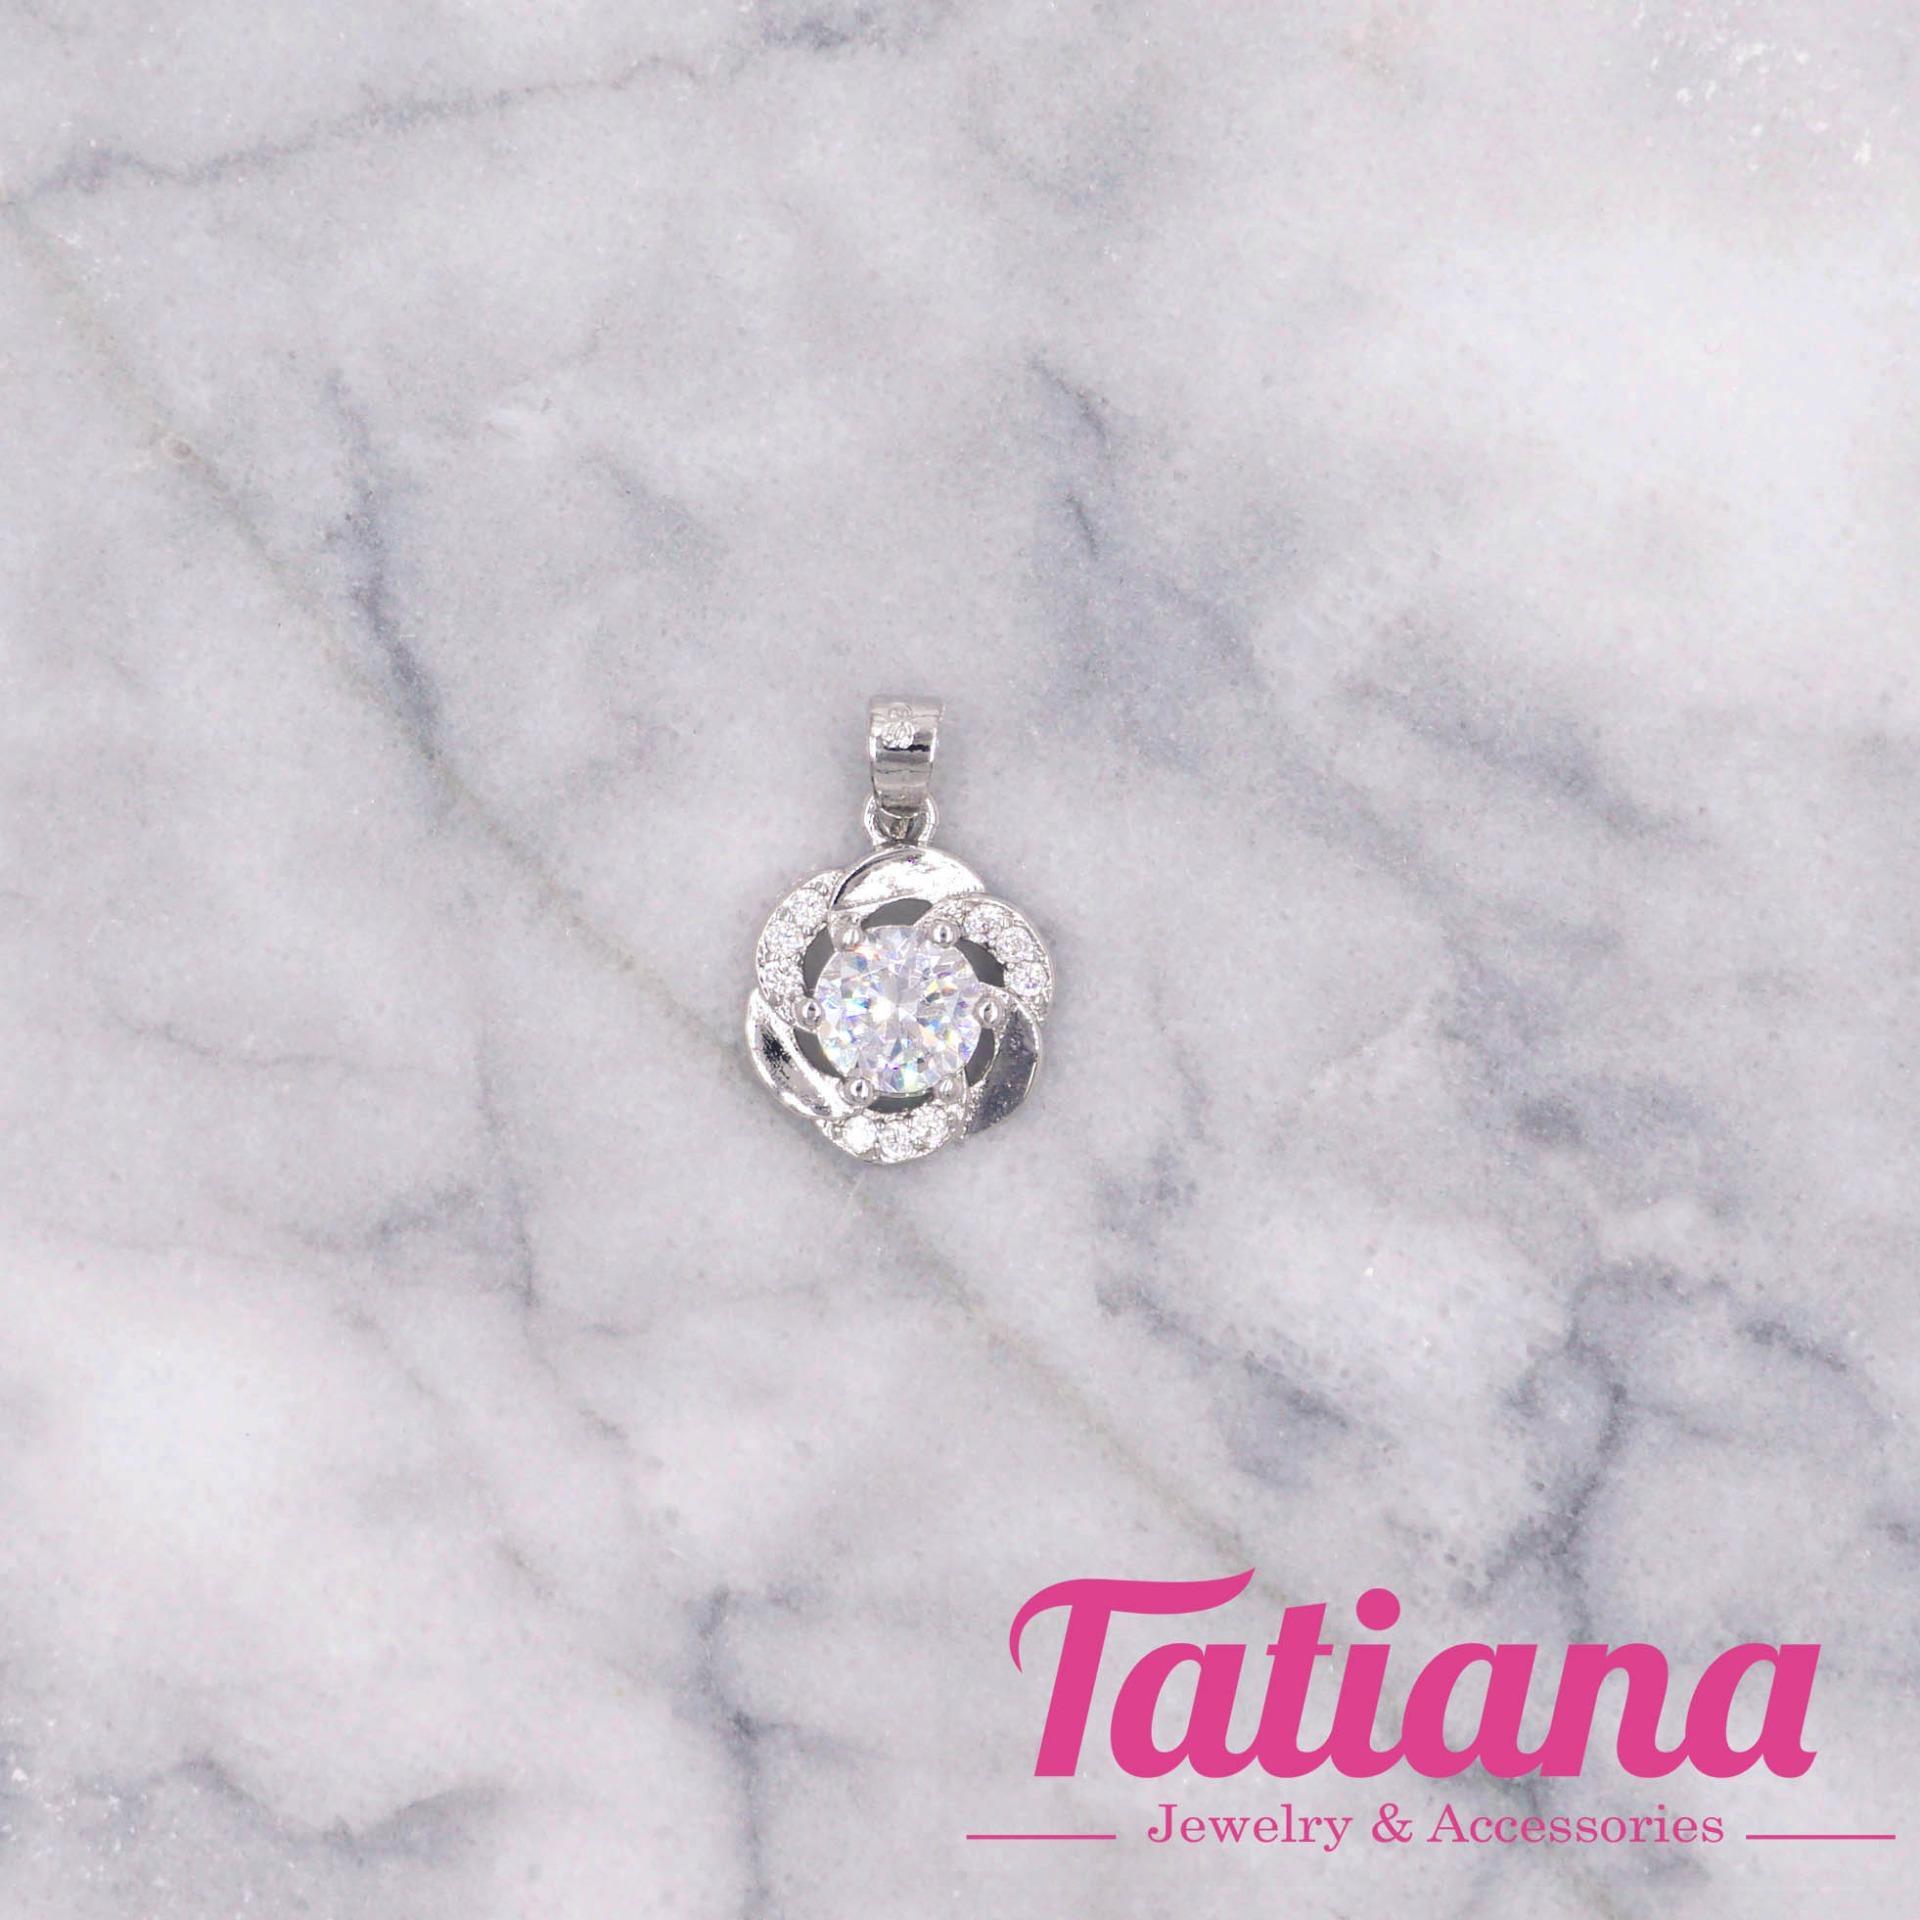 Mua Day Chuyền Hoa Đa Tatiana Db2600 Bạc Tatiana Trực Tuyến